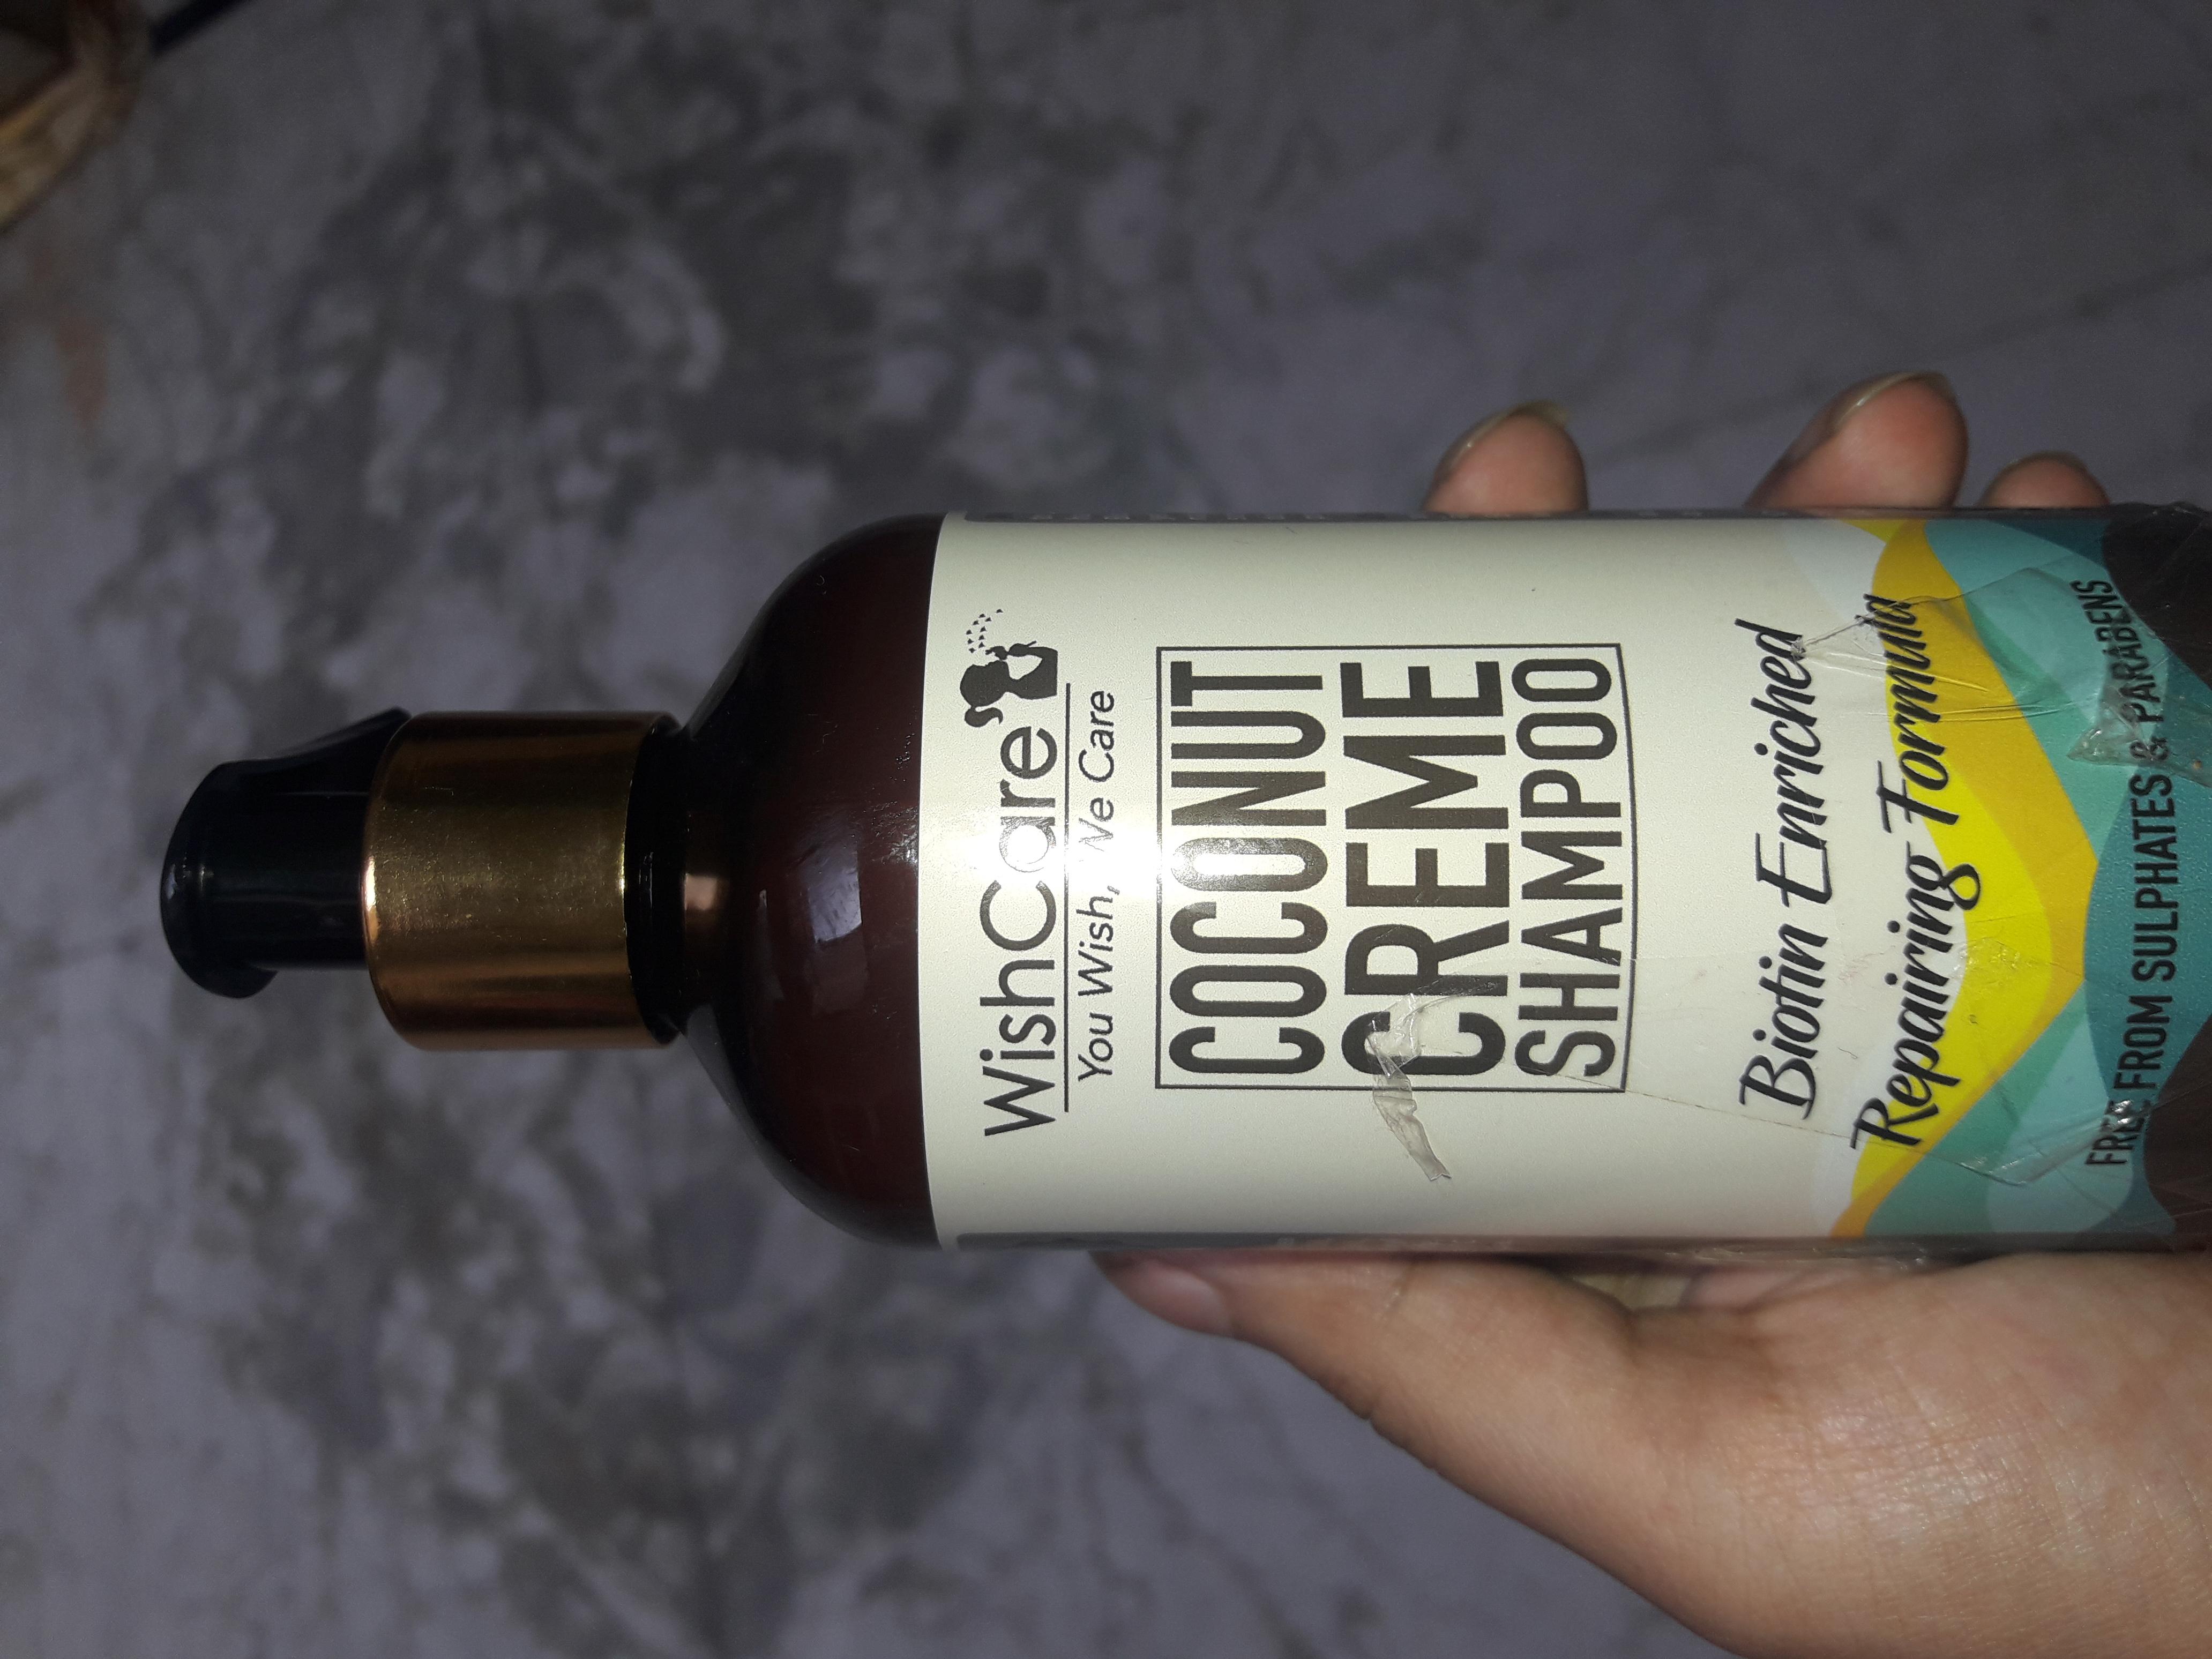 WishCare Coconut Creme Shampoo With Biotin-WishCare coconut creme shampoo with biotin review-By sarahshaikh007